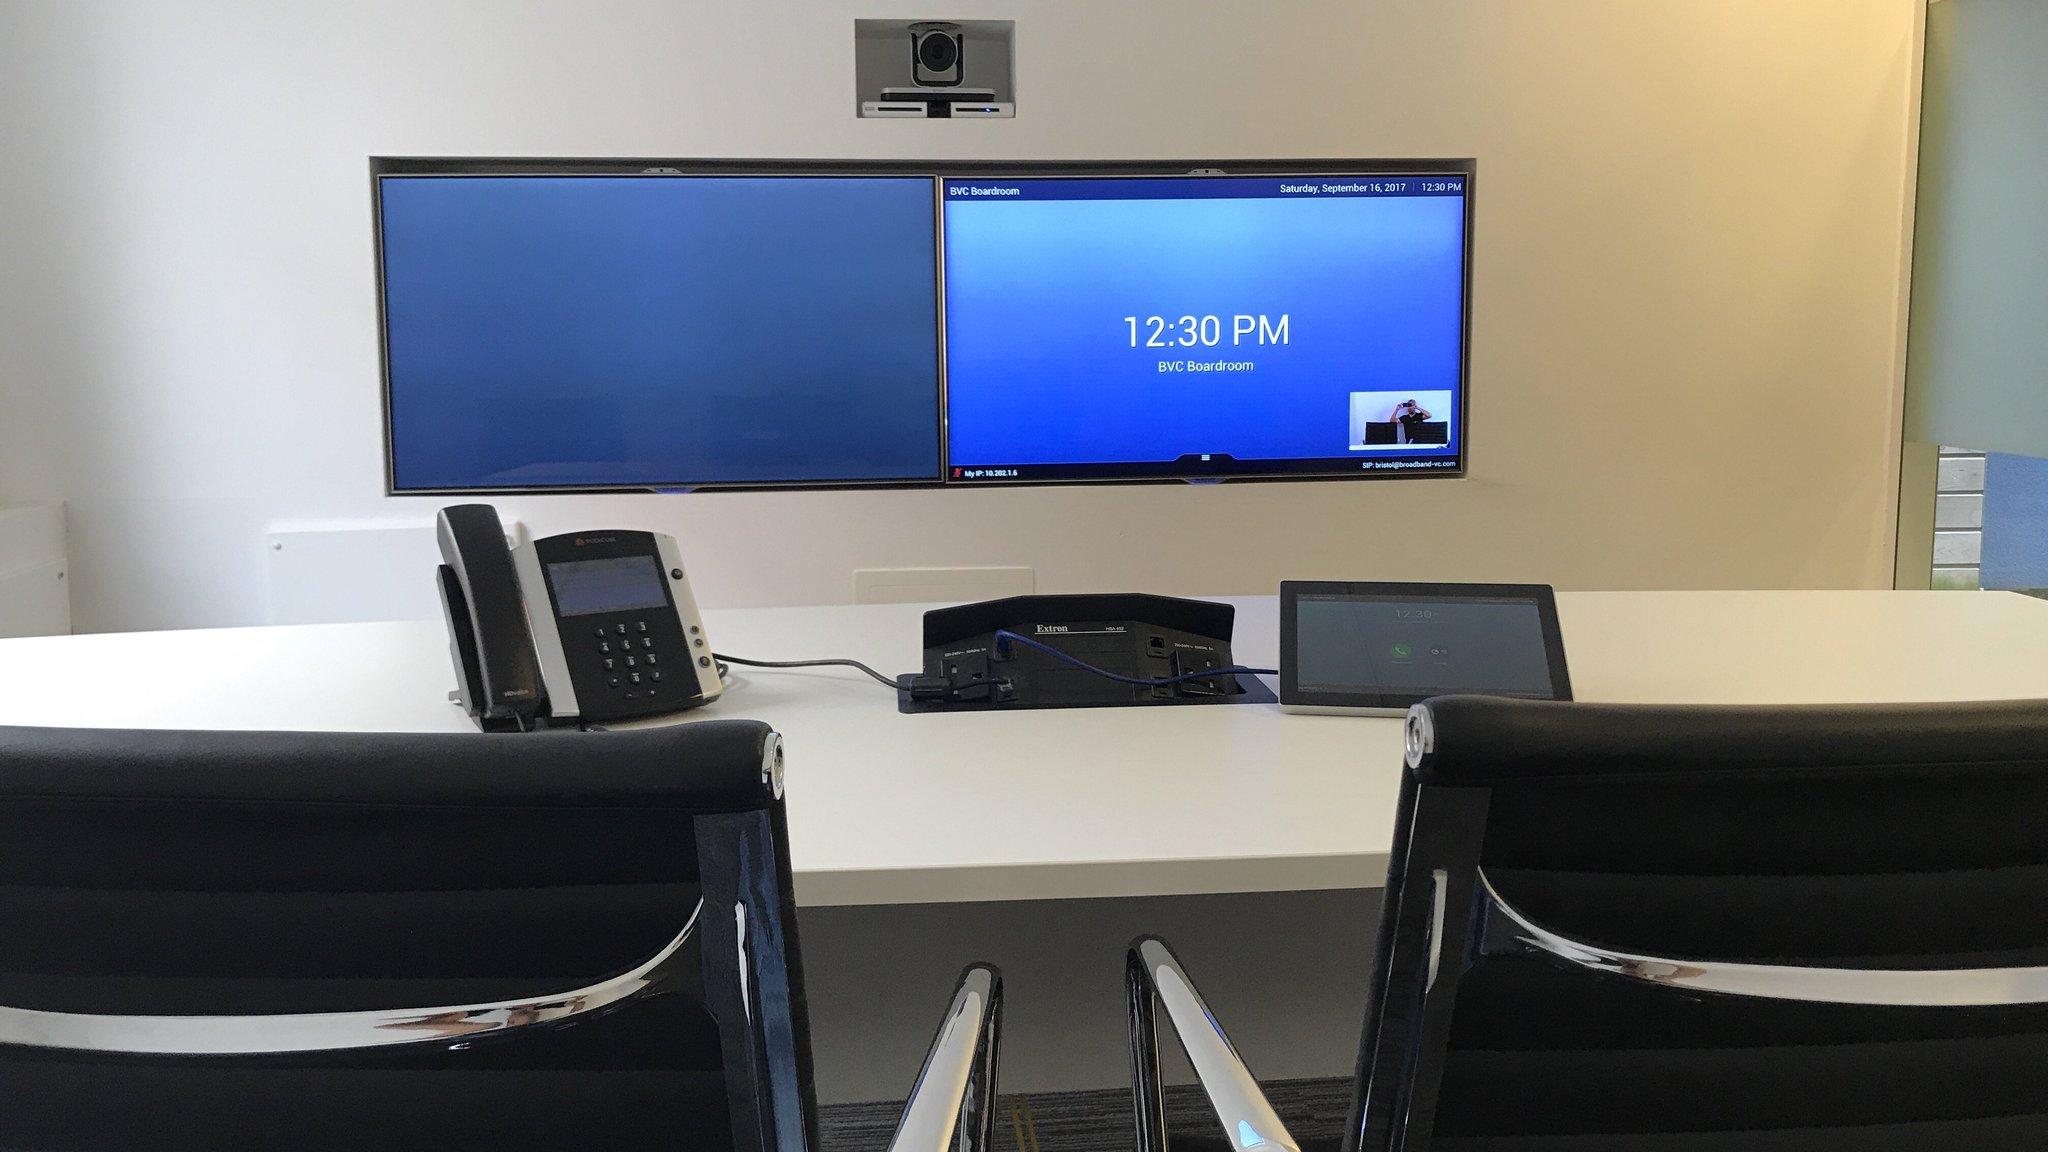 Welcome to Broadband Visual Communications